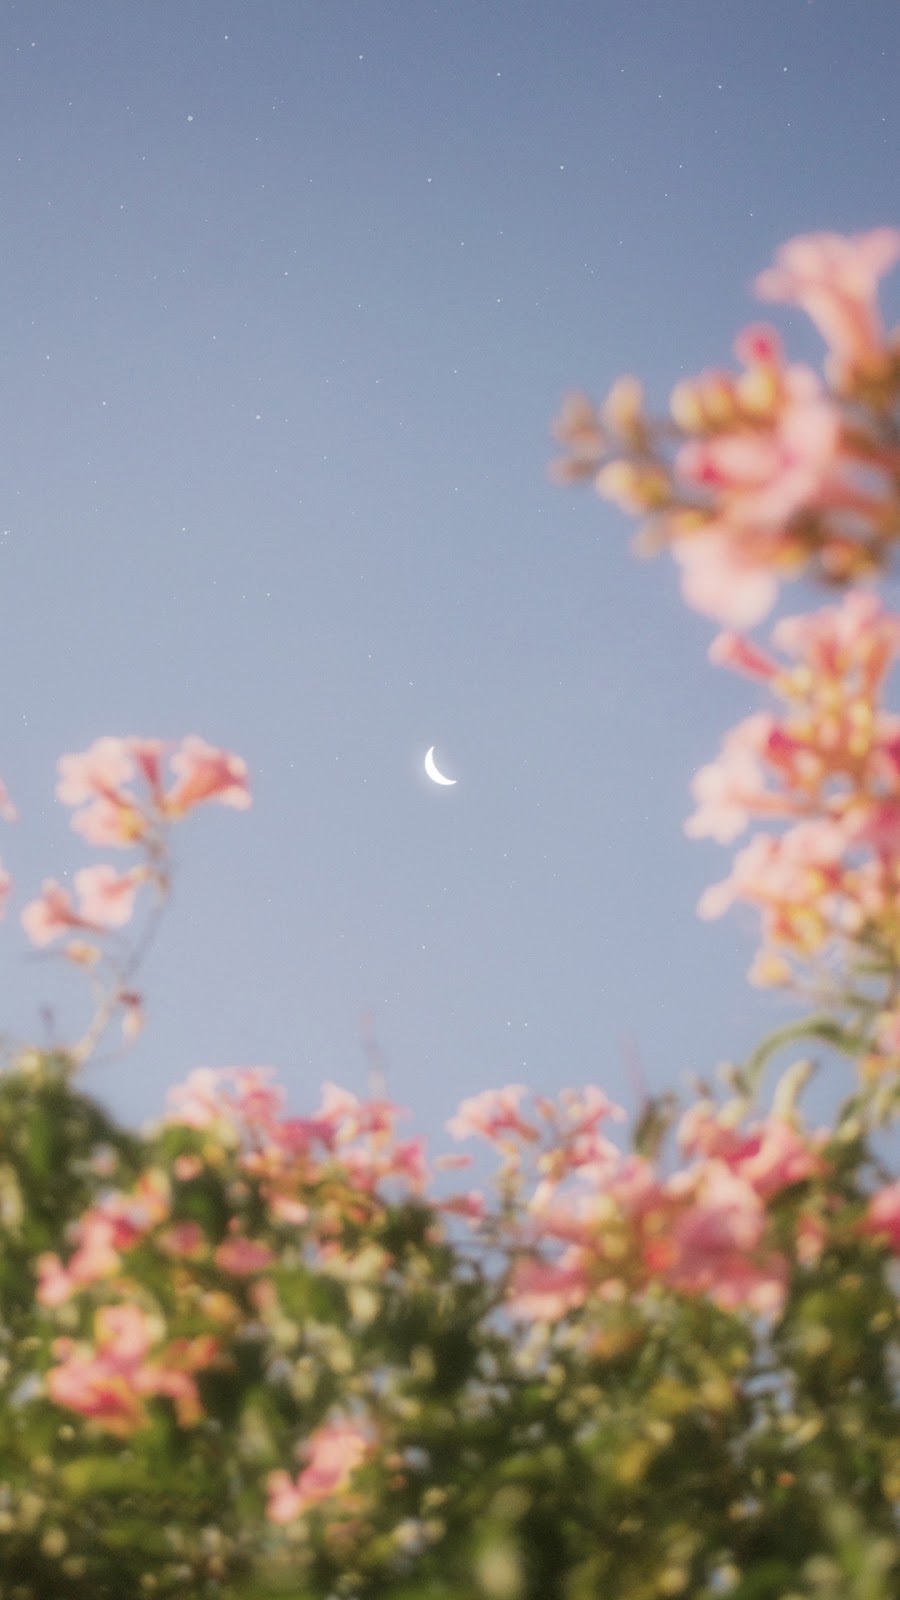 Hoa giữa bầu trời